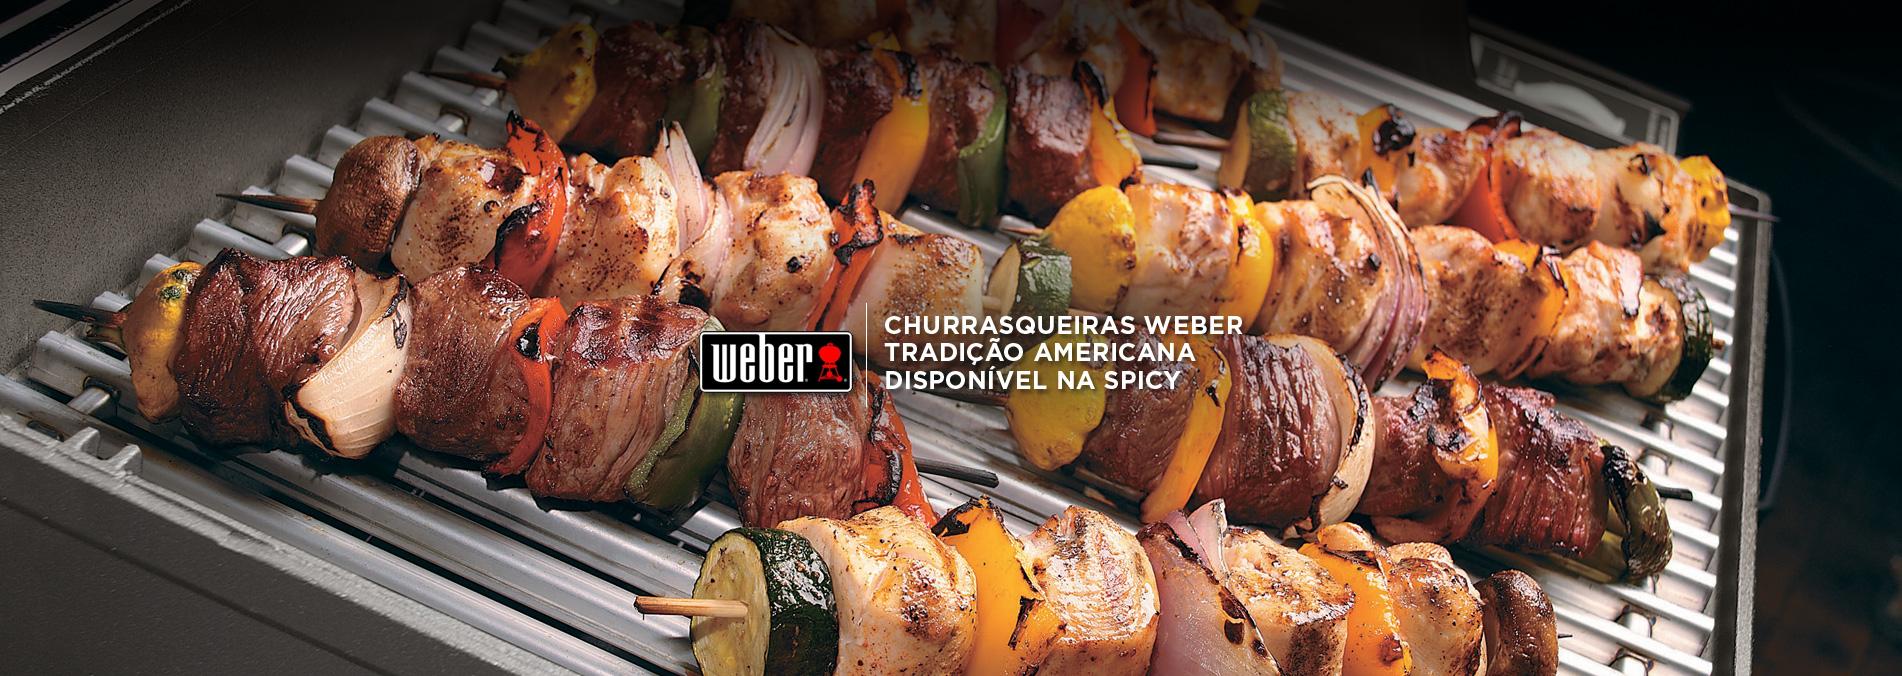 banner-churrasco-1